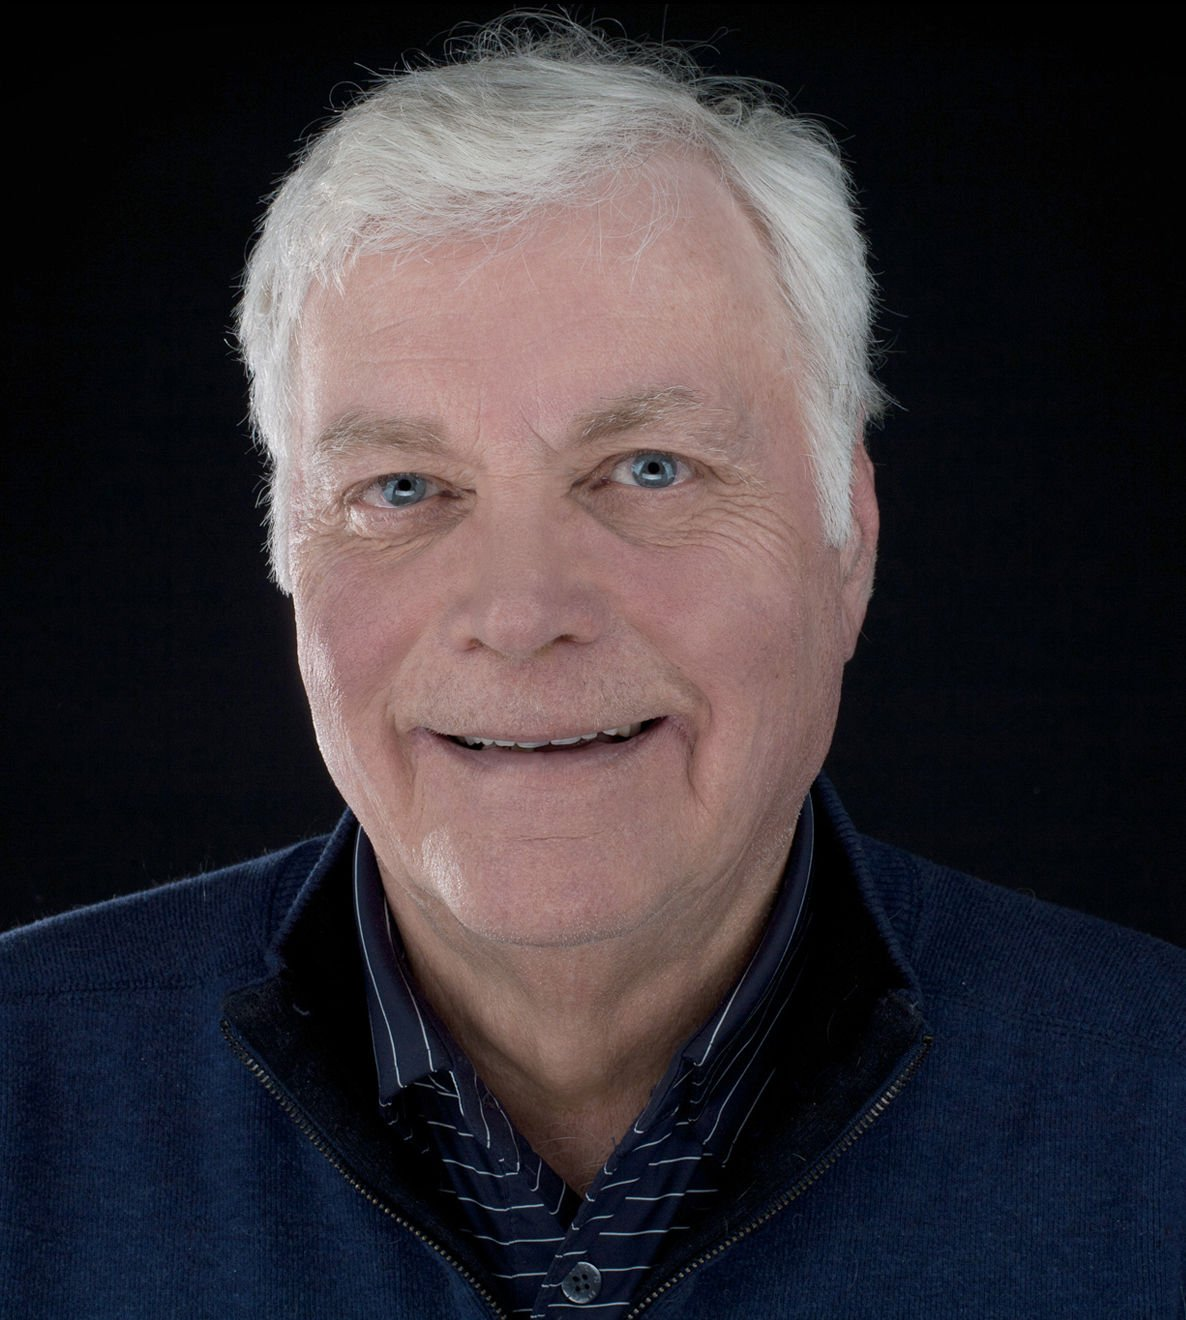 Dennis Anhalt